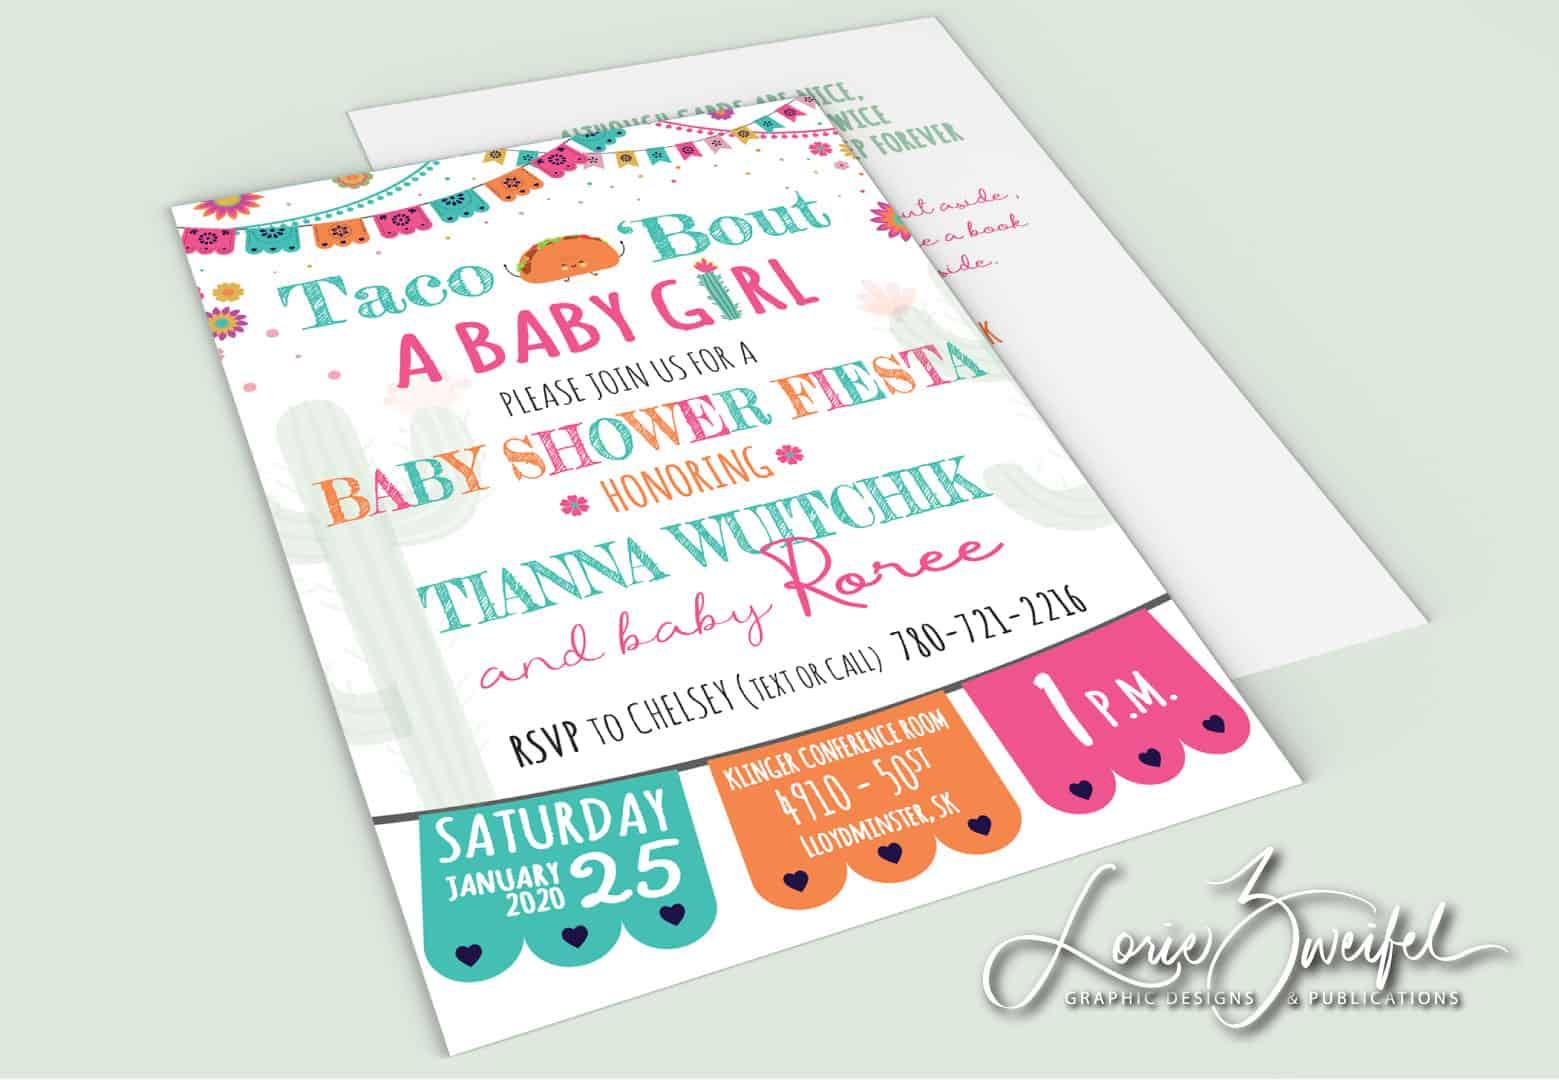 Baby-Shower Invitations